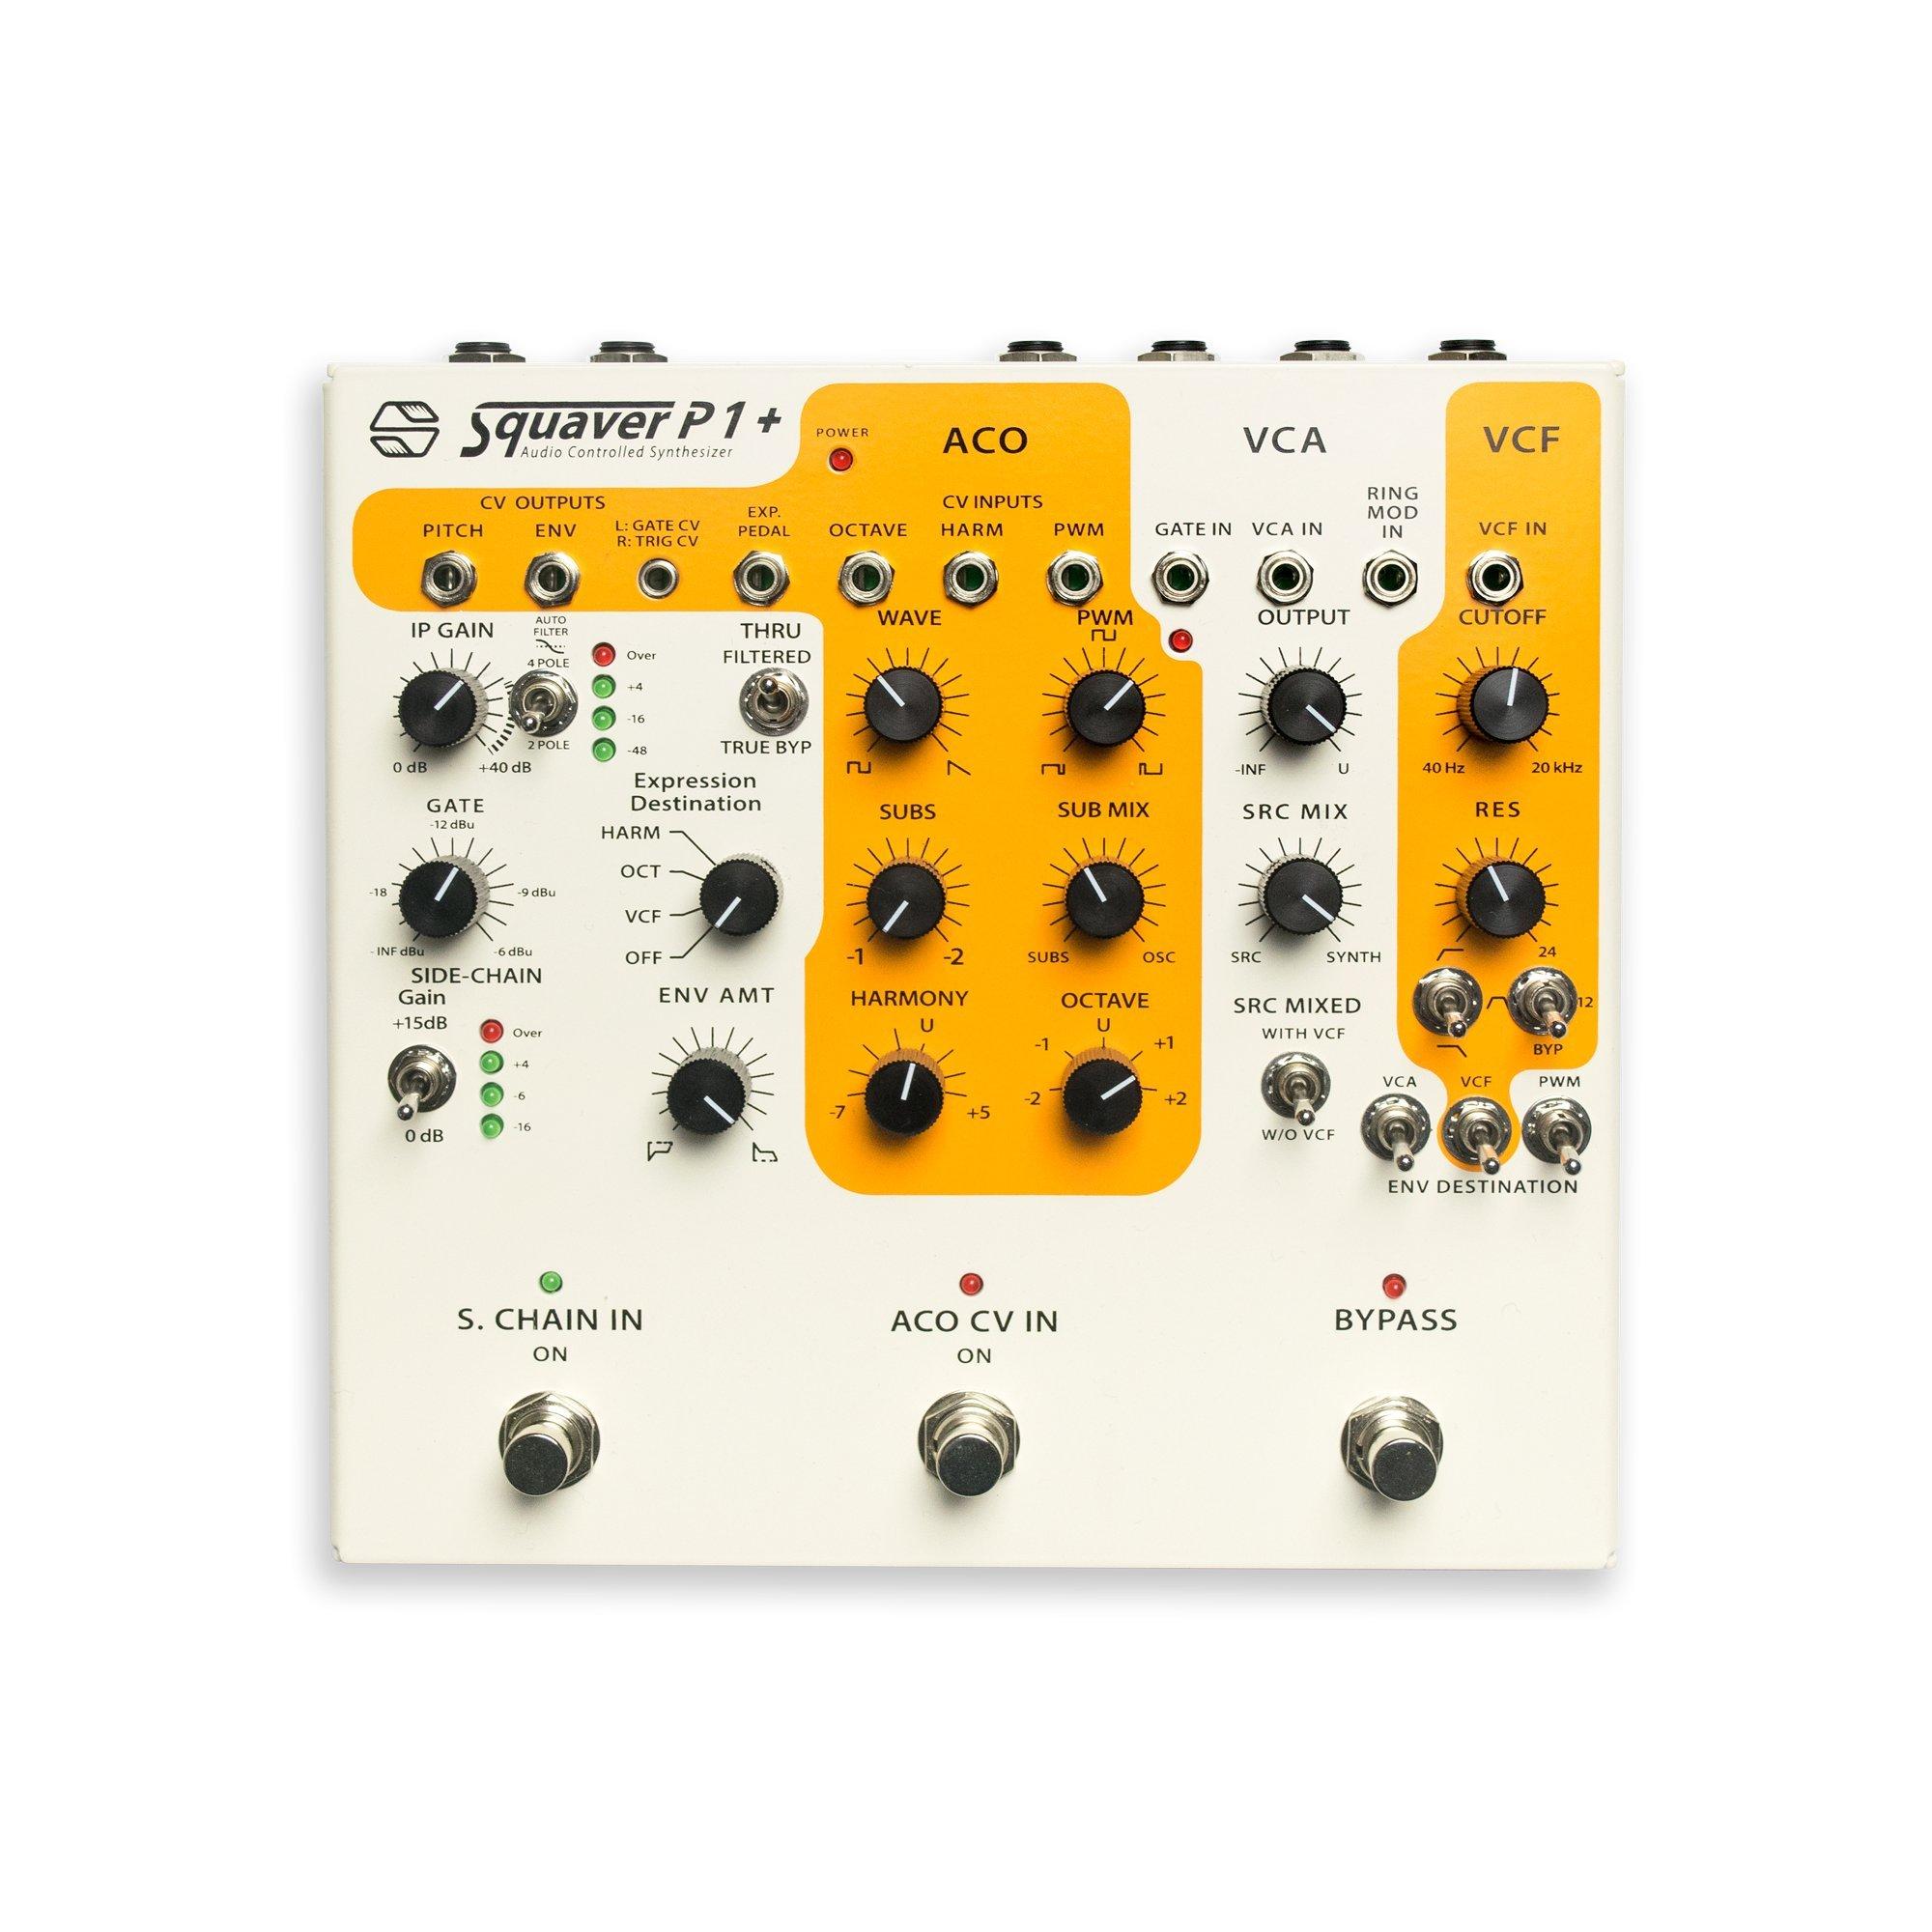 Squaver P1+ : Semi-Modulor Analog Audio-Controlled Synthesizer Pedal